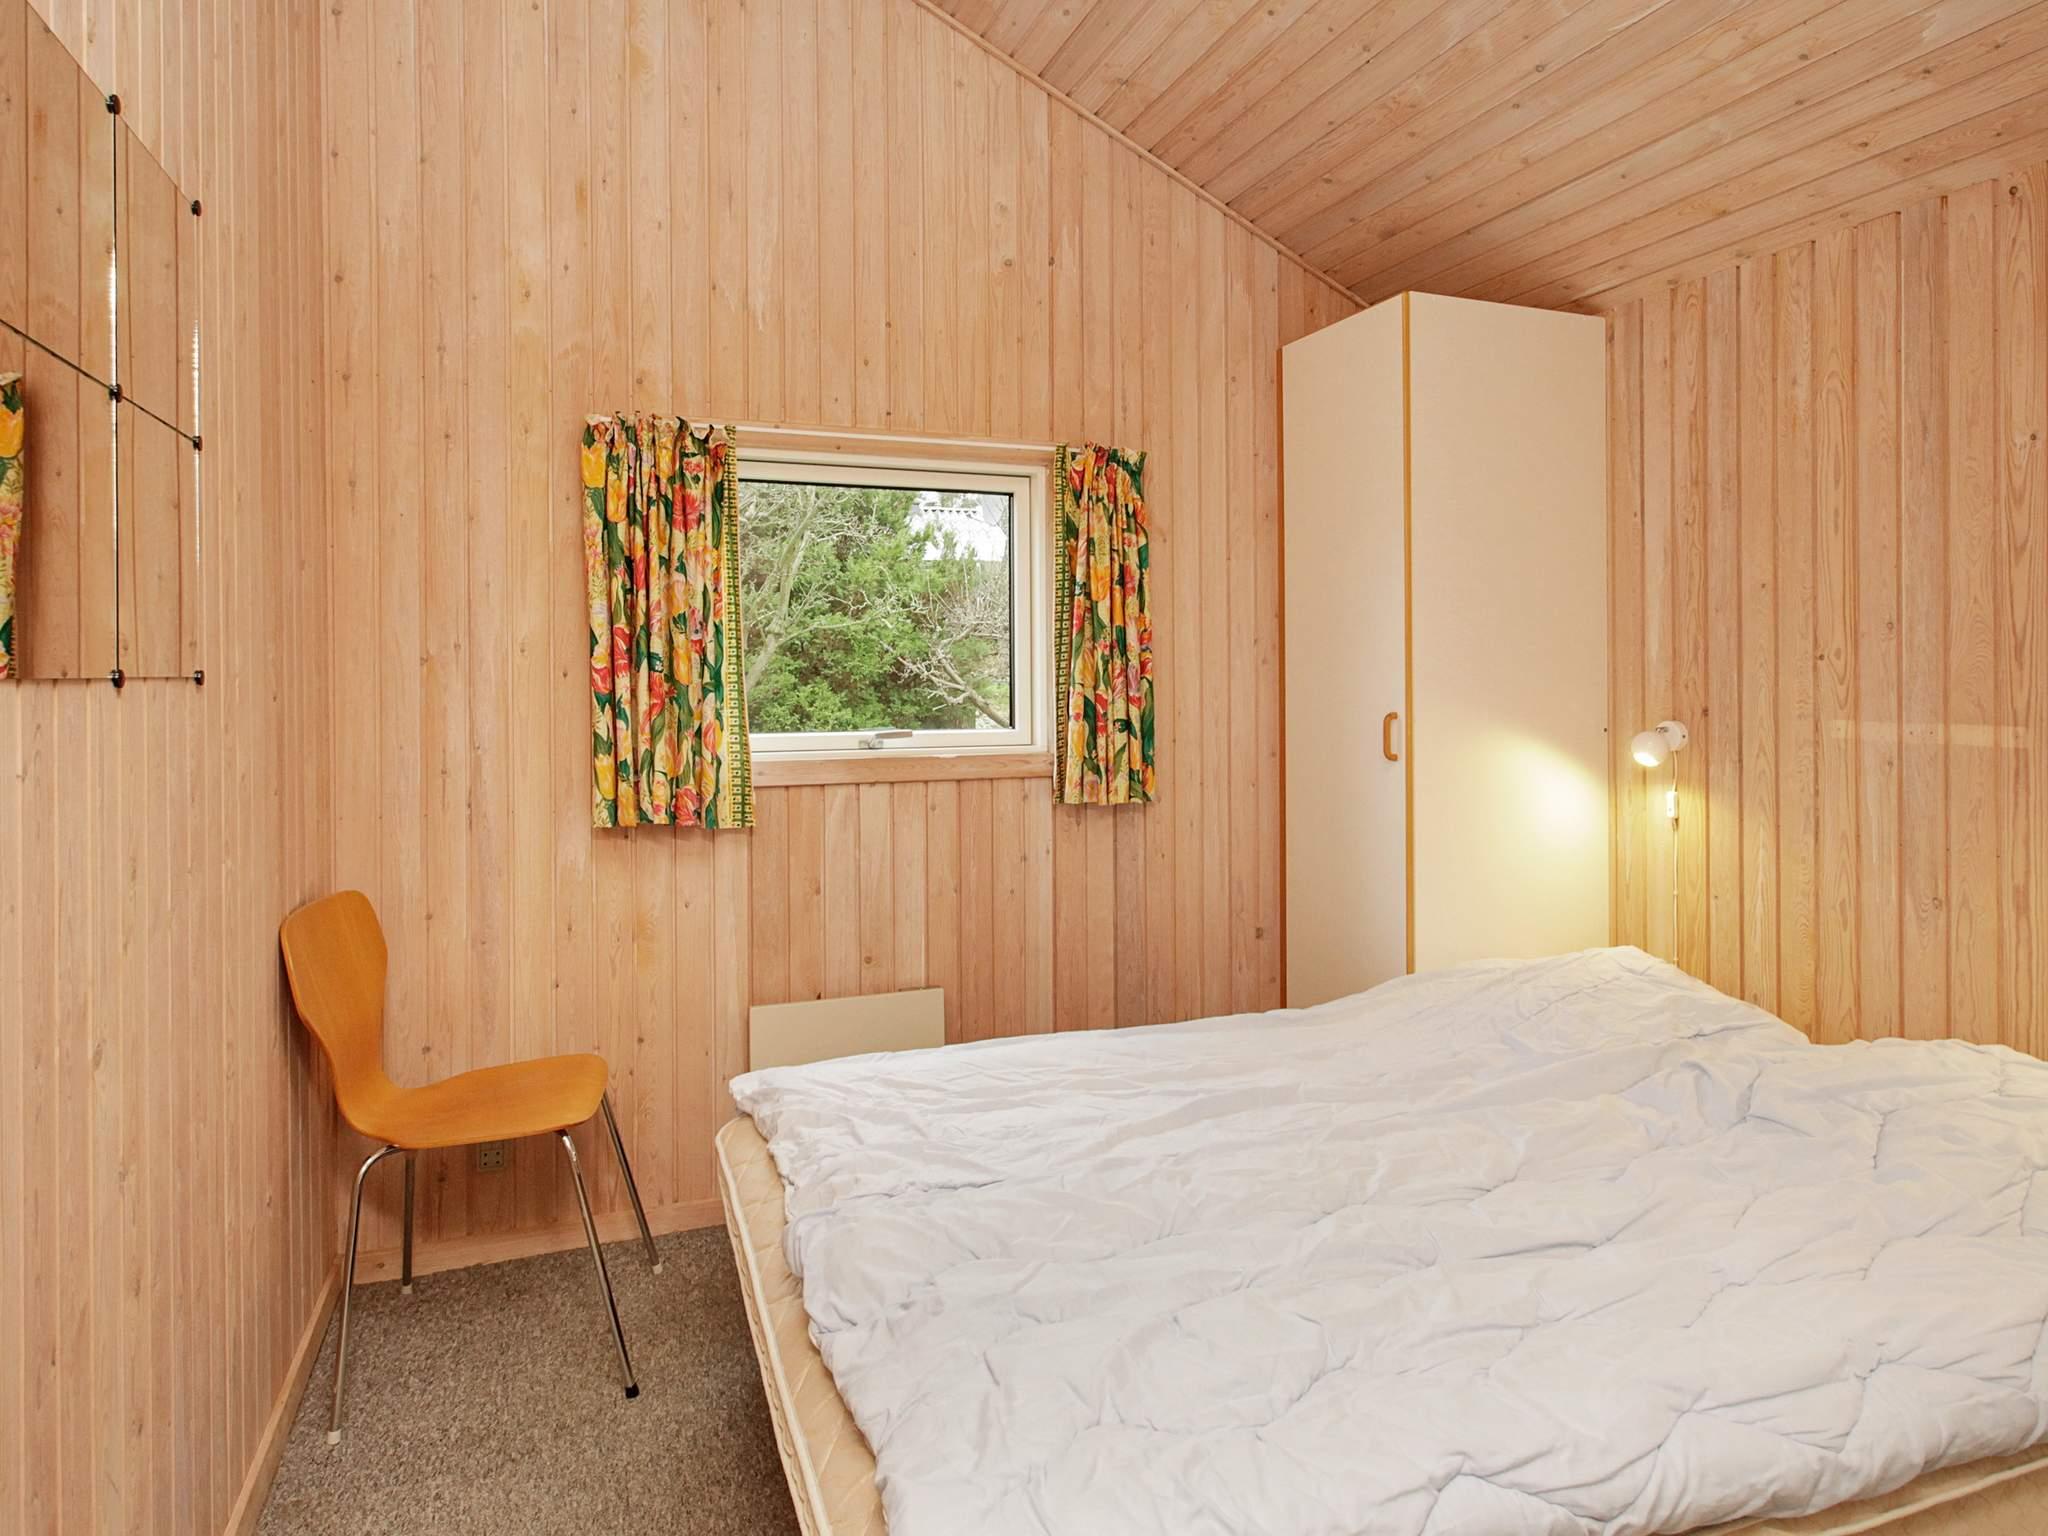 Ferienhaus Fredmosen (596960), Humble, , Langeland, Dänemark, Bild 14